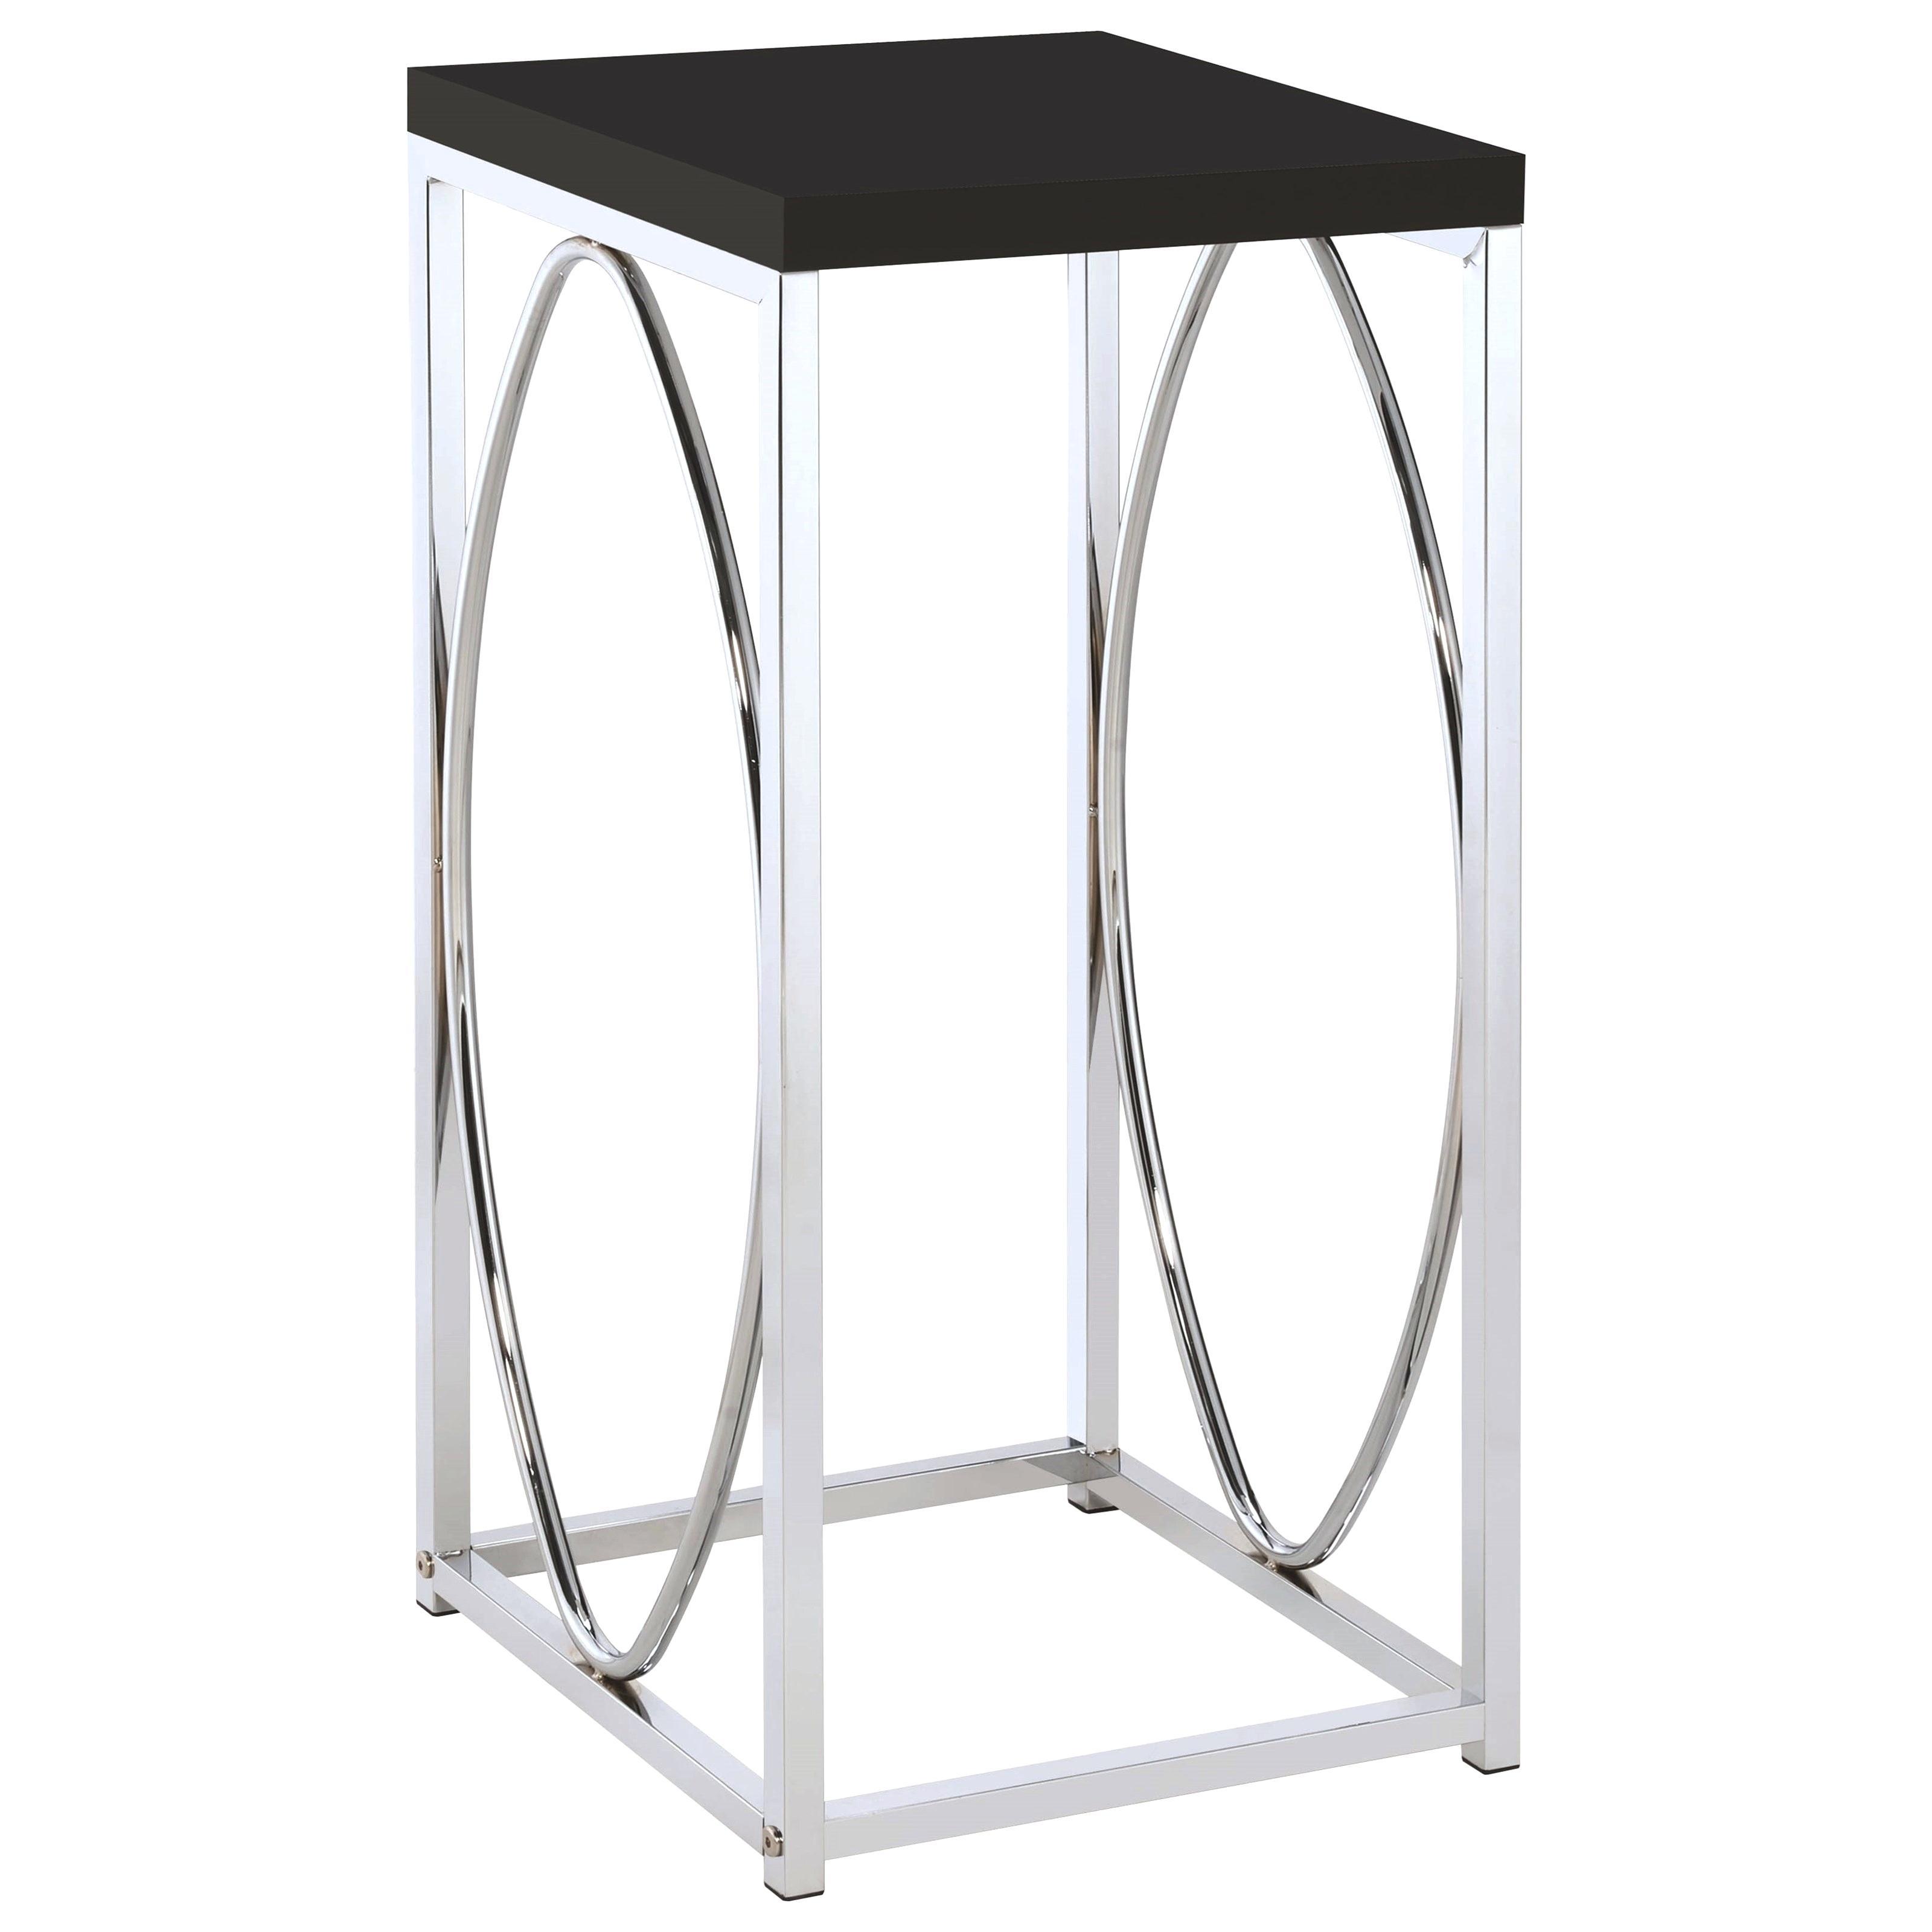 decoration unique accent tables high end couture line collection coaster contemporary table with black top fine furniture avani mango wood drum astoria patio set small plastic